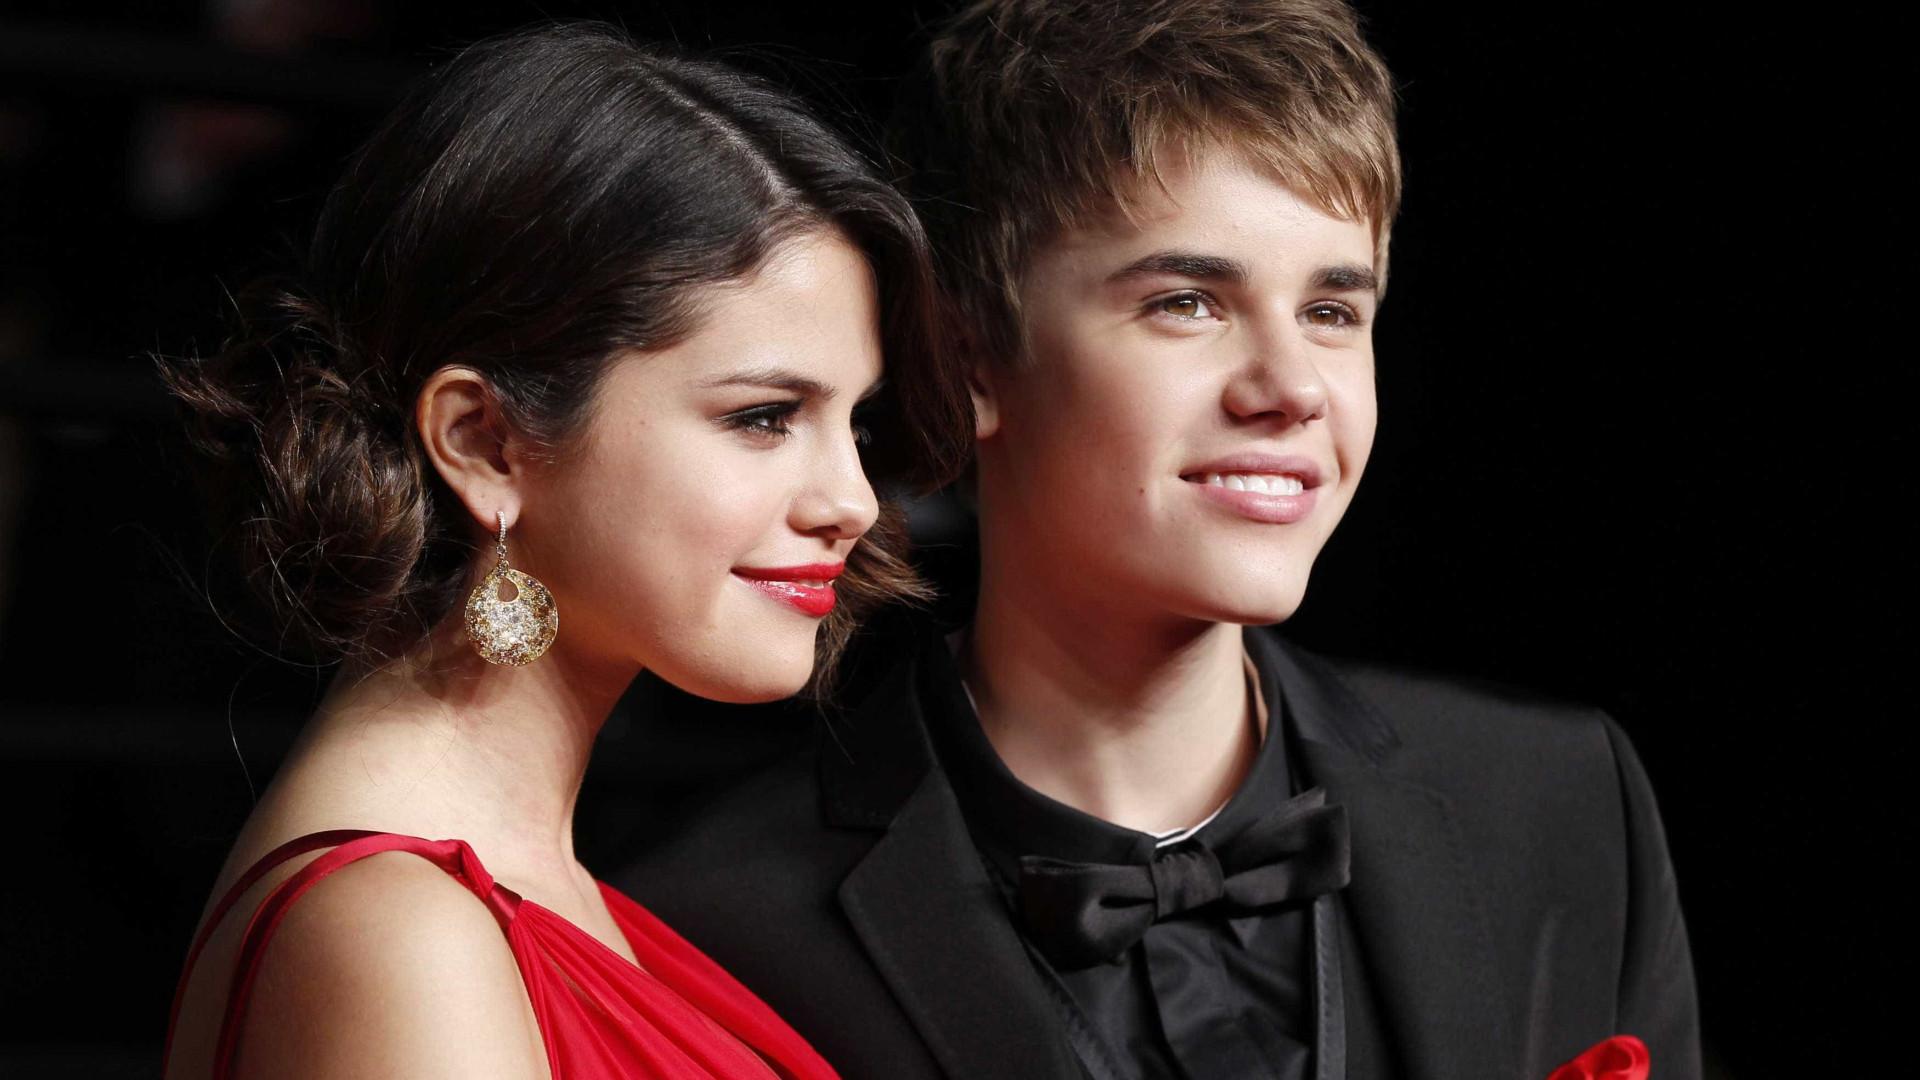 'Nunca iremos aceitar Justin Bieber', diz família de Selena Gomez